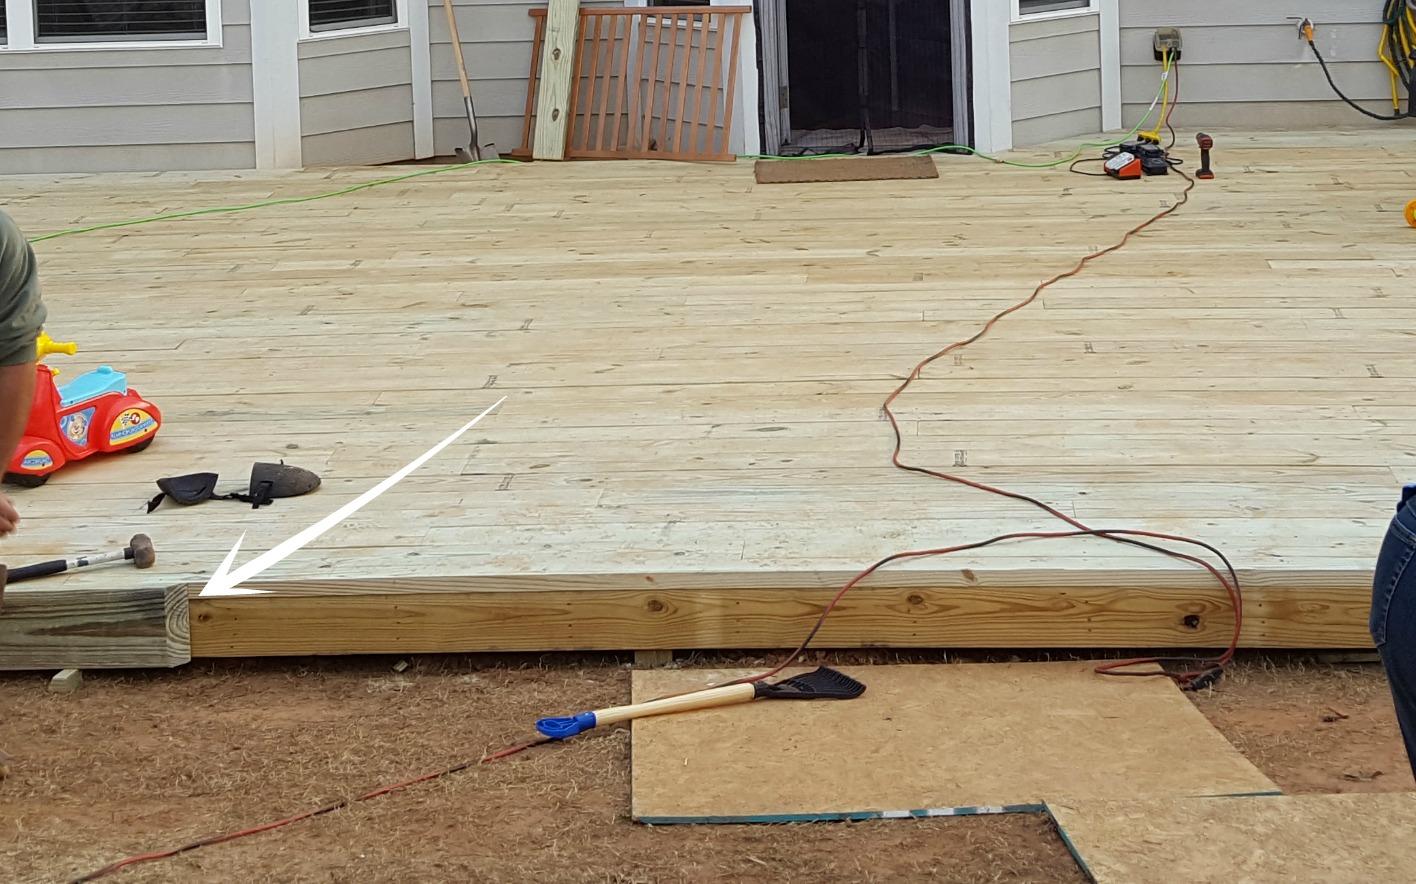 Duo ventures diy floating ground level deck for 4 8 meter decking boards